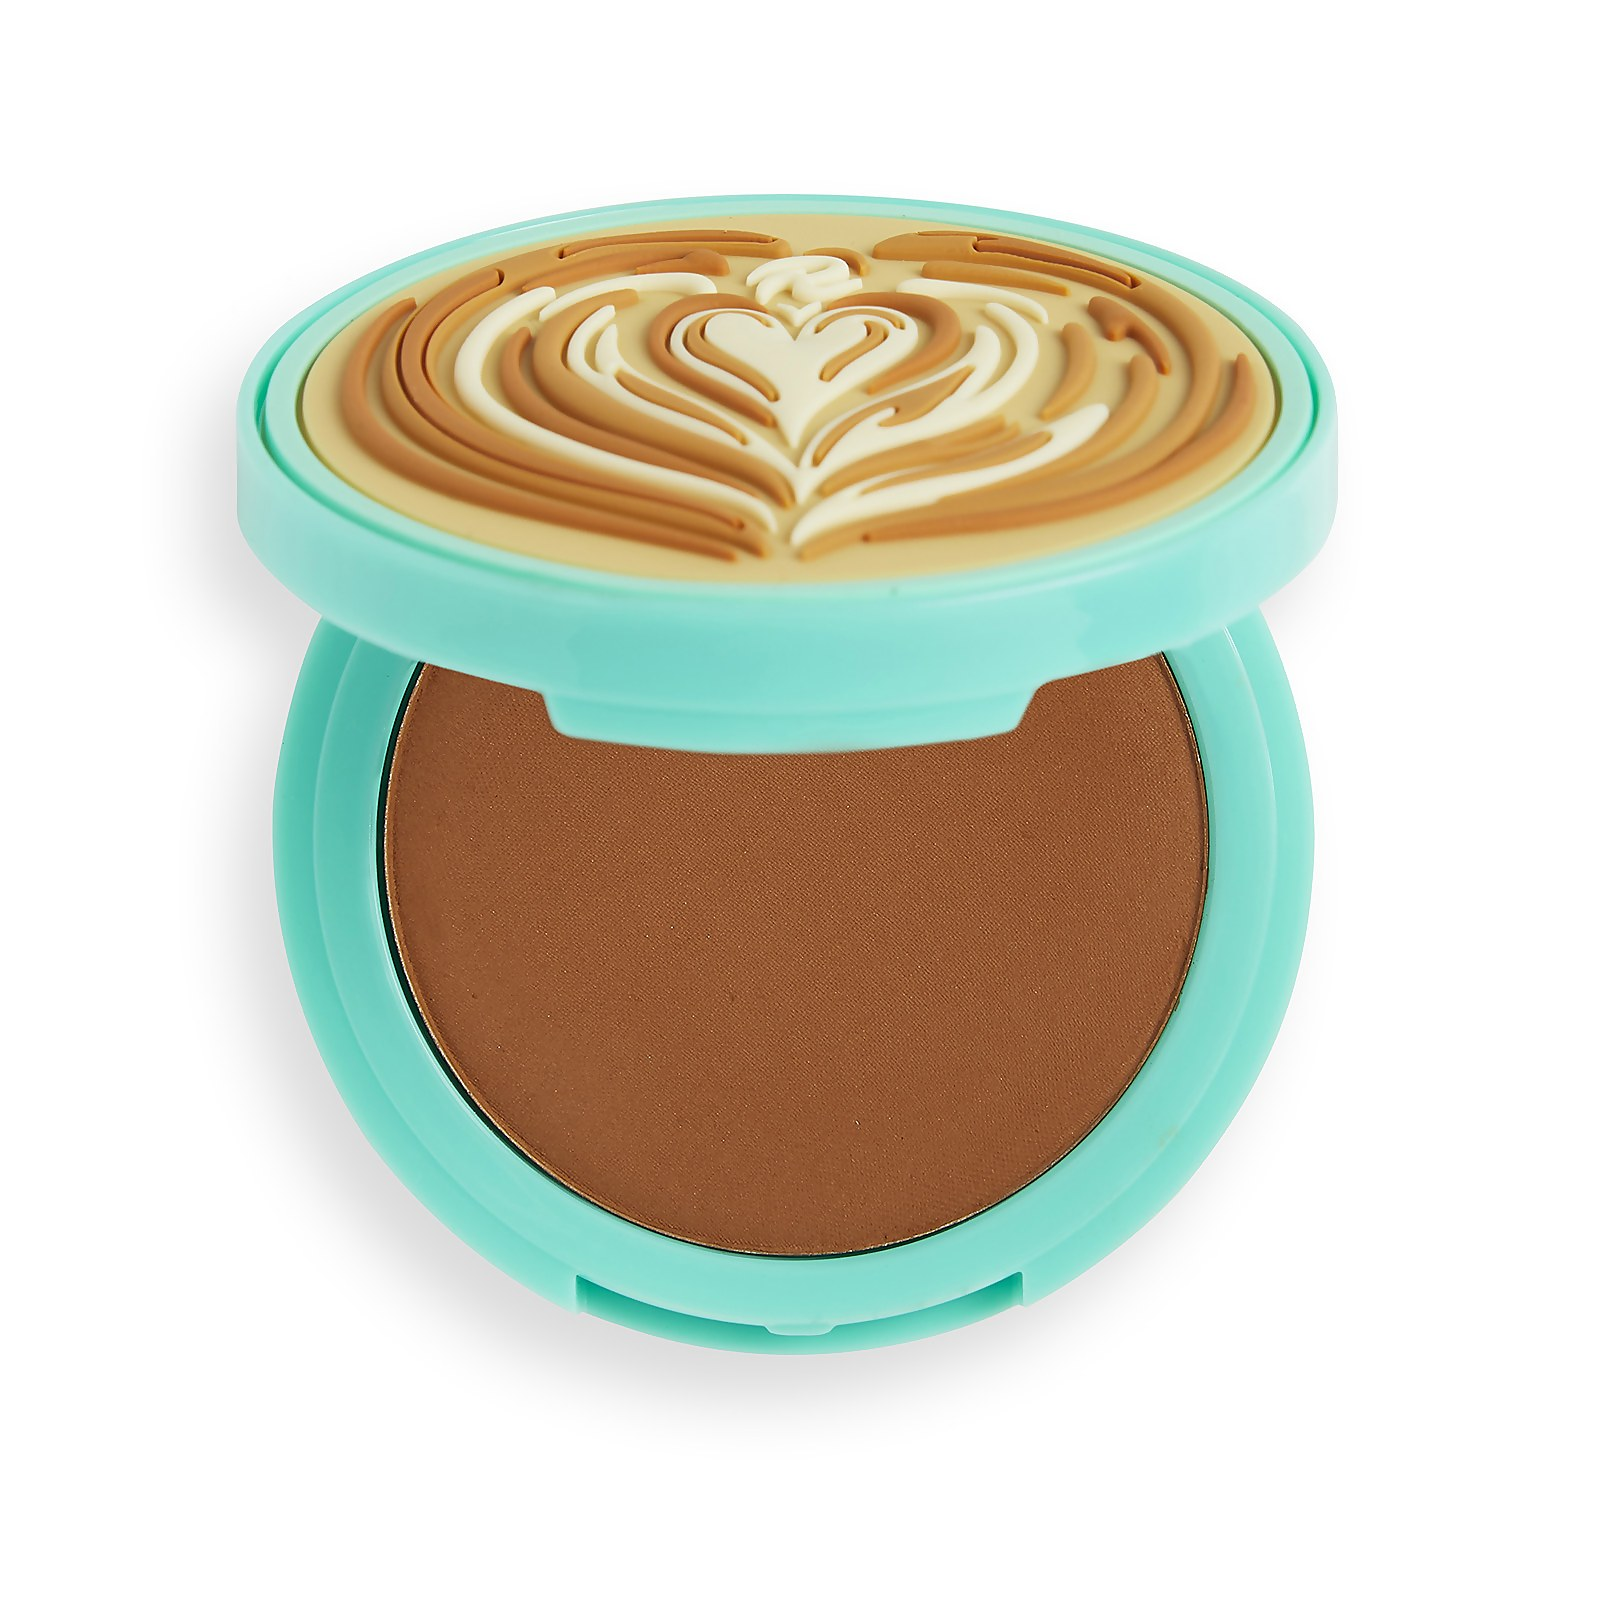 Купить Бронзер Revolution I Heart Revolution Tasty Coffee Bronzer - Макиато